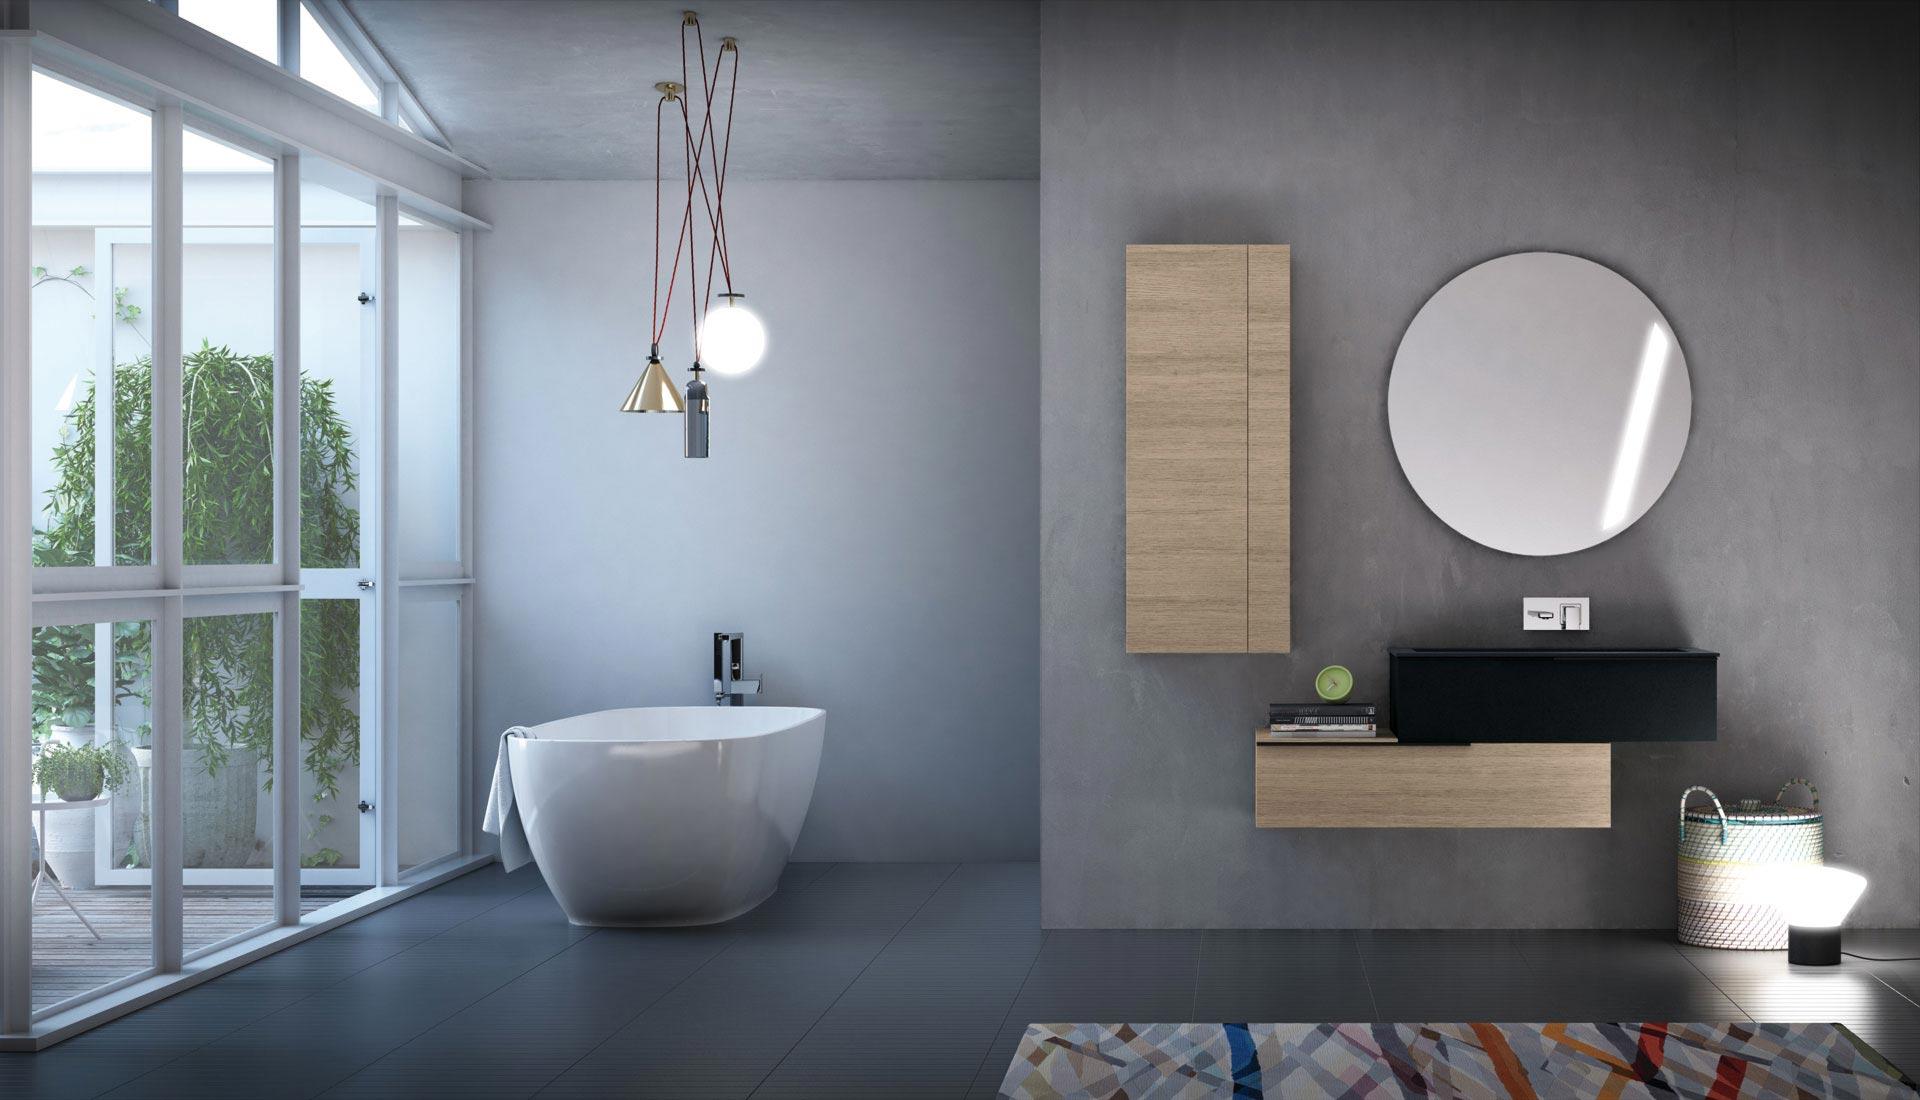 Arredo bagno puntotre mobili e arredamento bagno per la casa for Arredamento